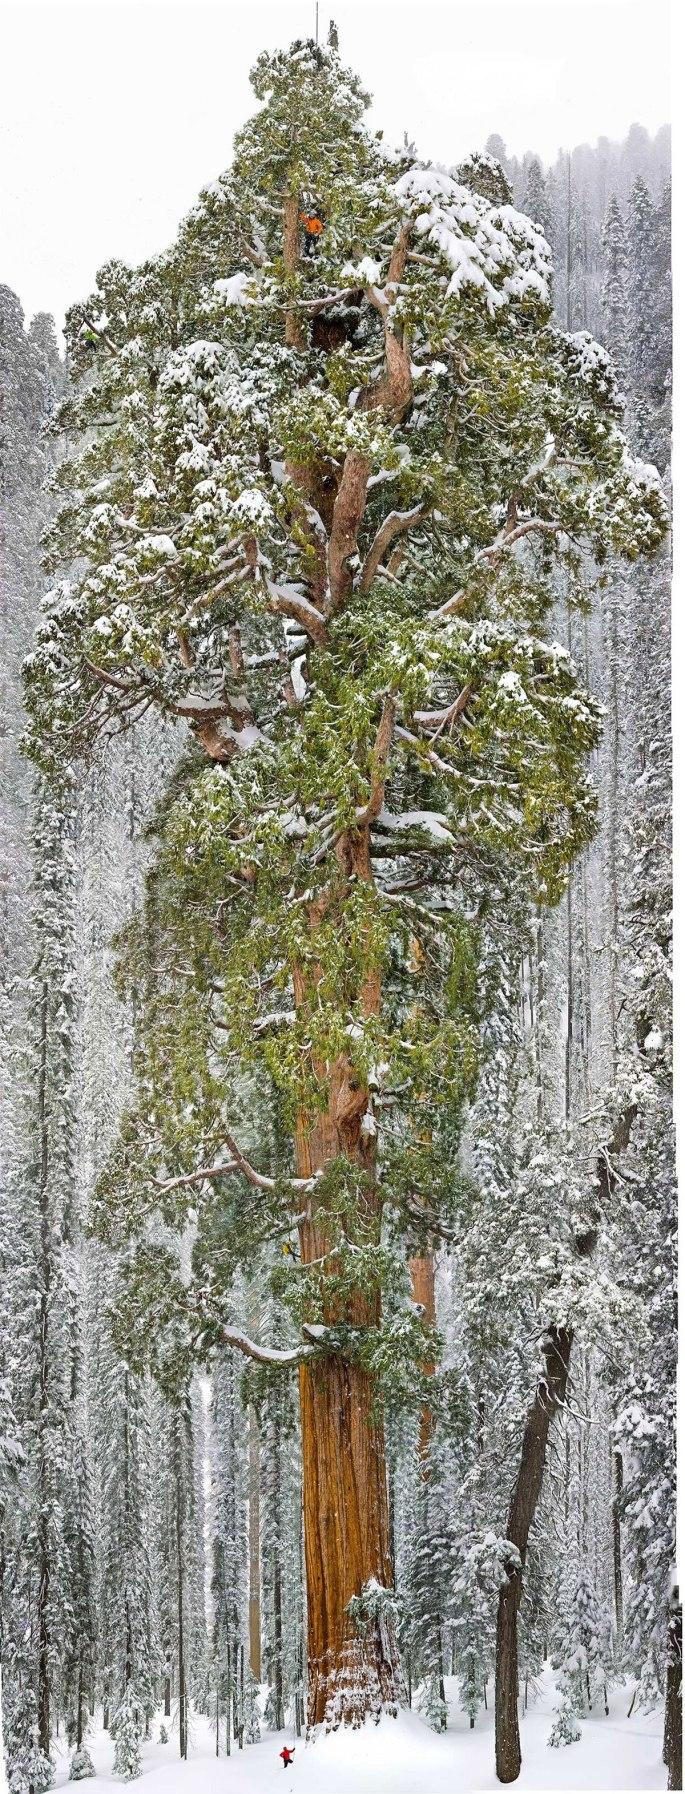 sequoia-geant-president-3200-ans